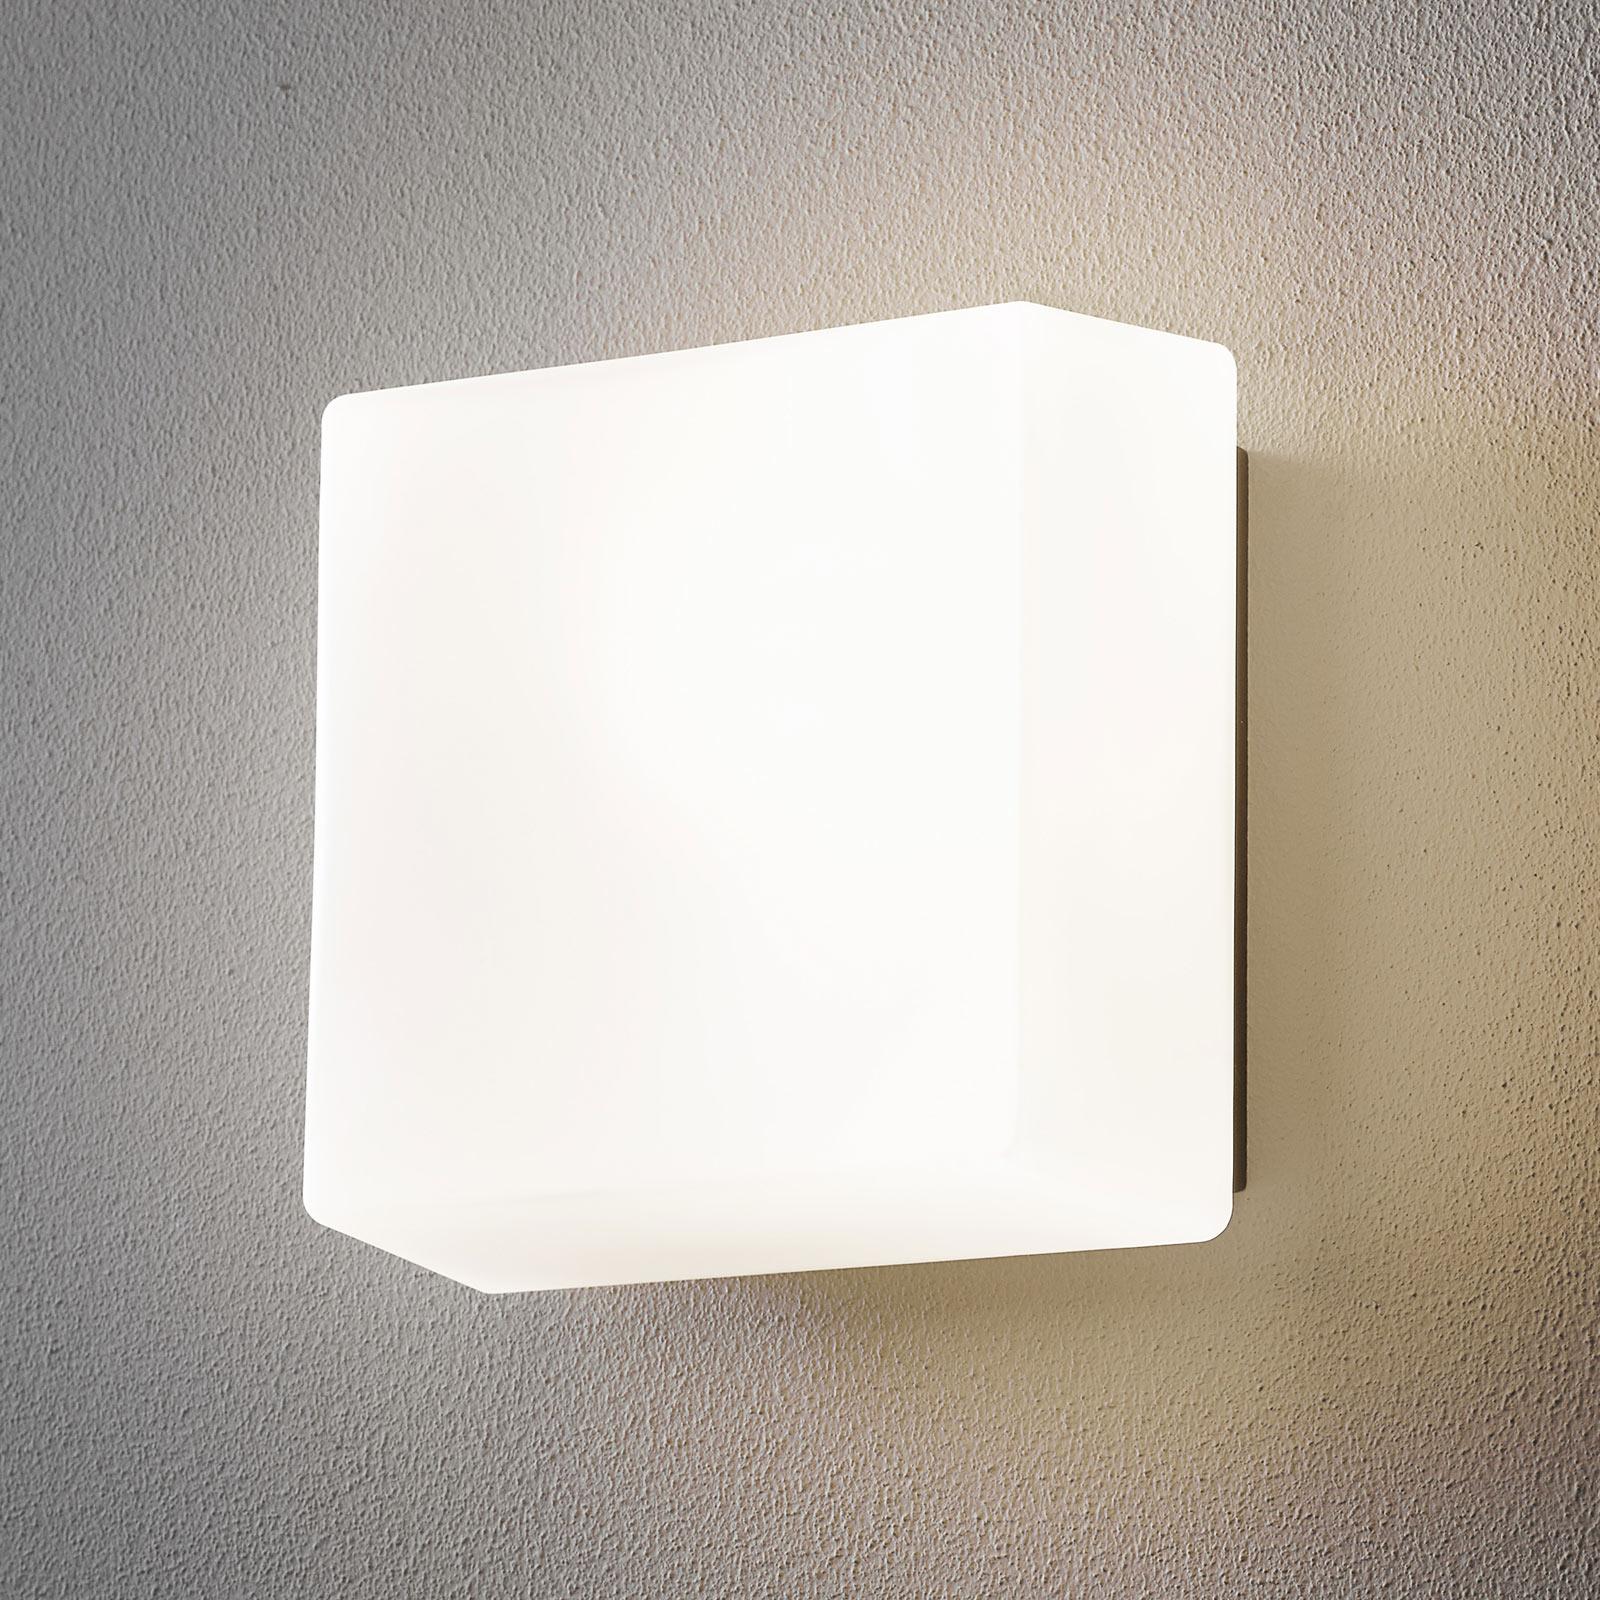 BEGA Lichtbaustein 66658 Wandleuchte 21x21 cm, E27